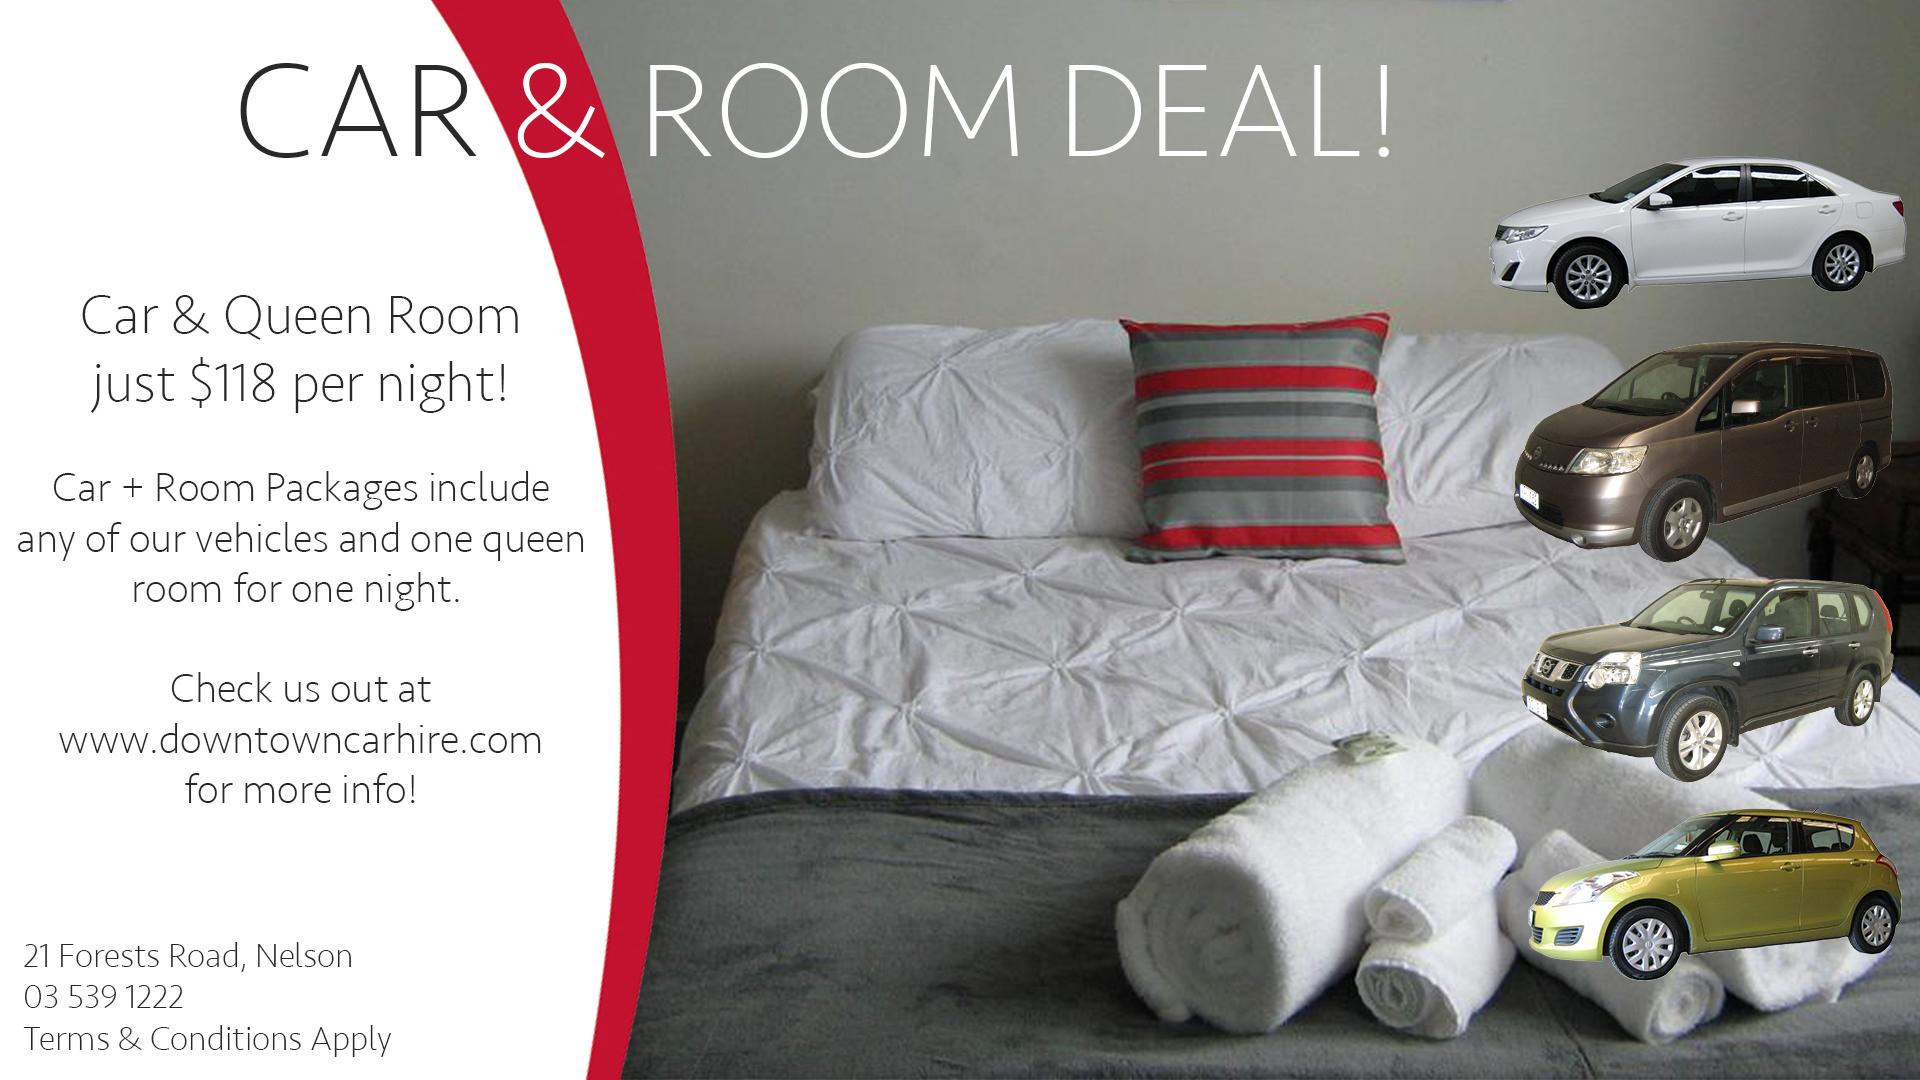 Car + Room Deal.jpg